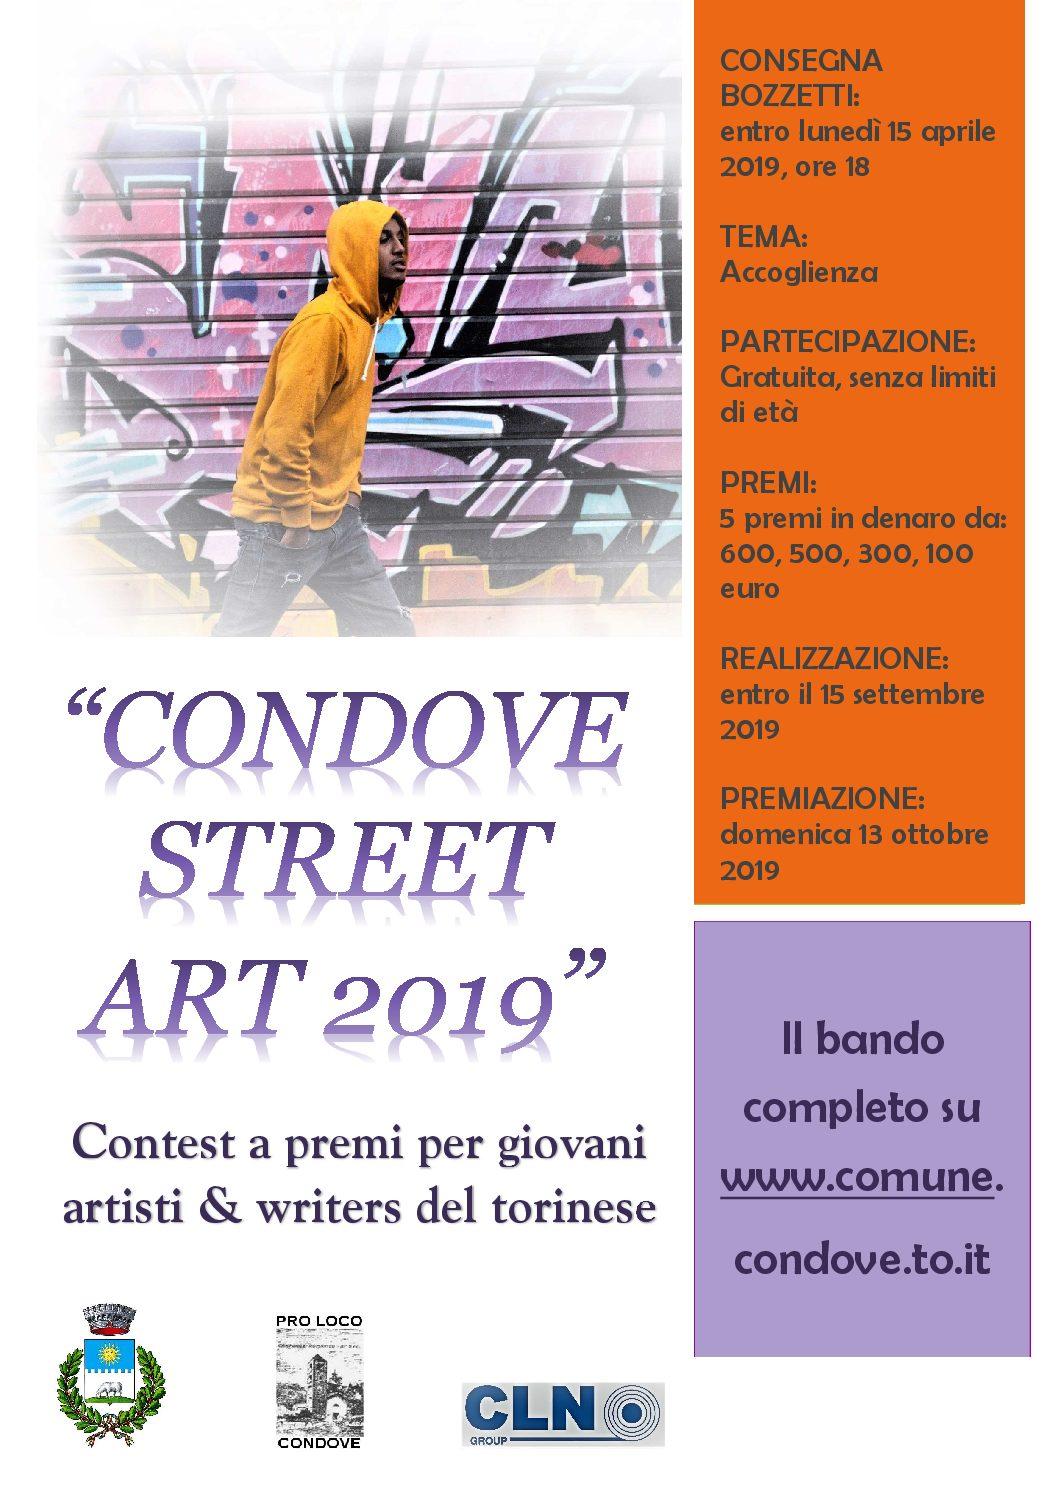 CONDOVE STREET ART 2019